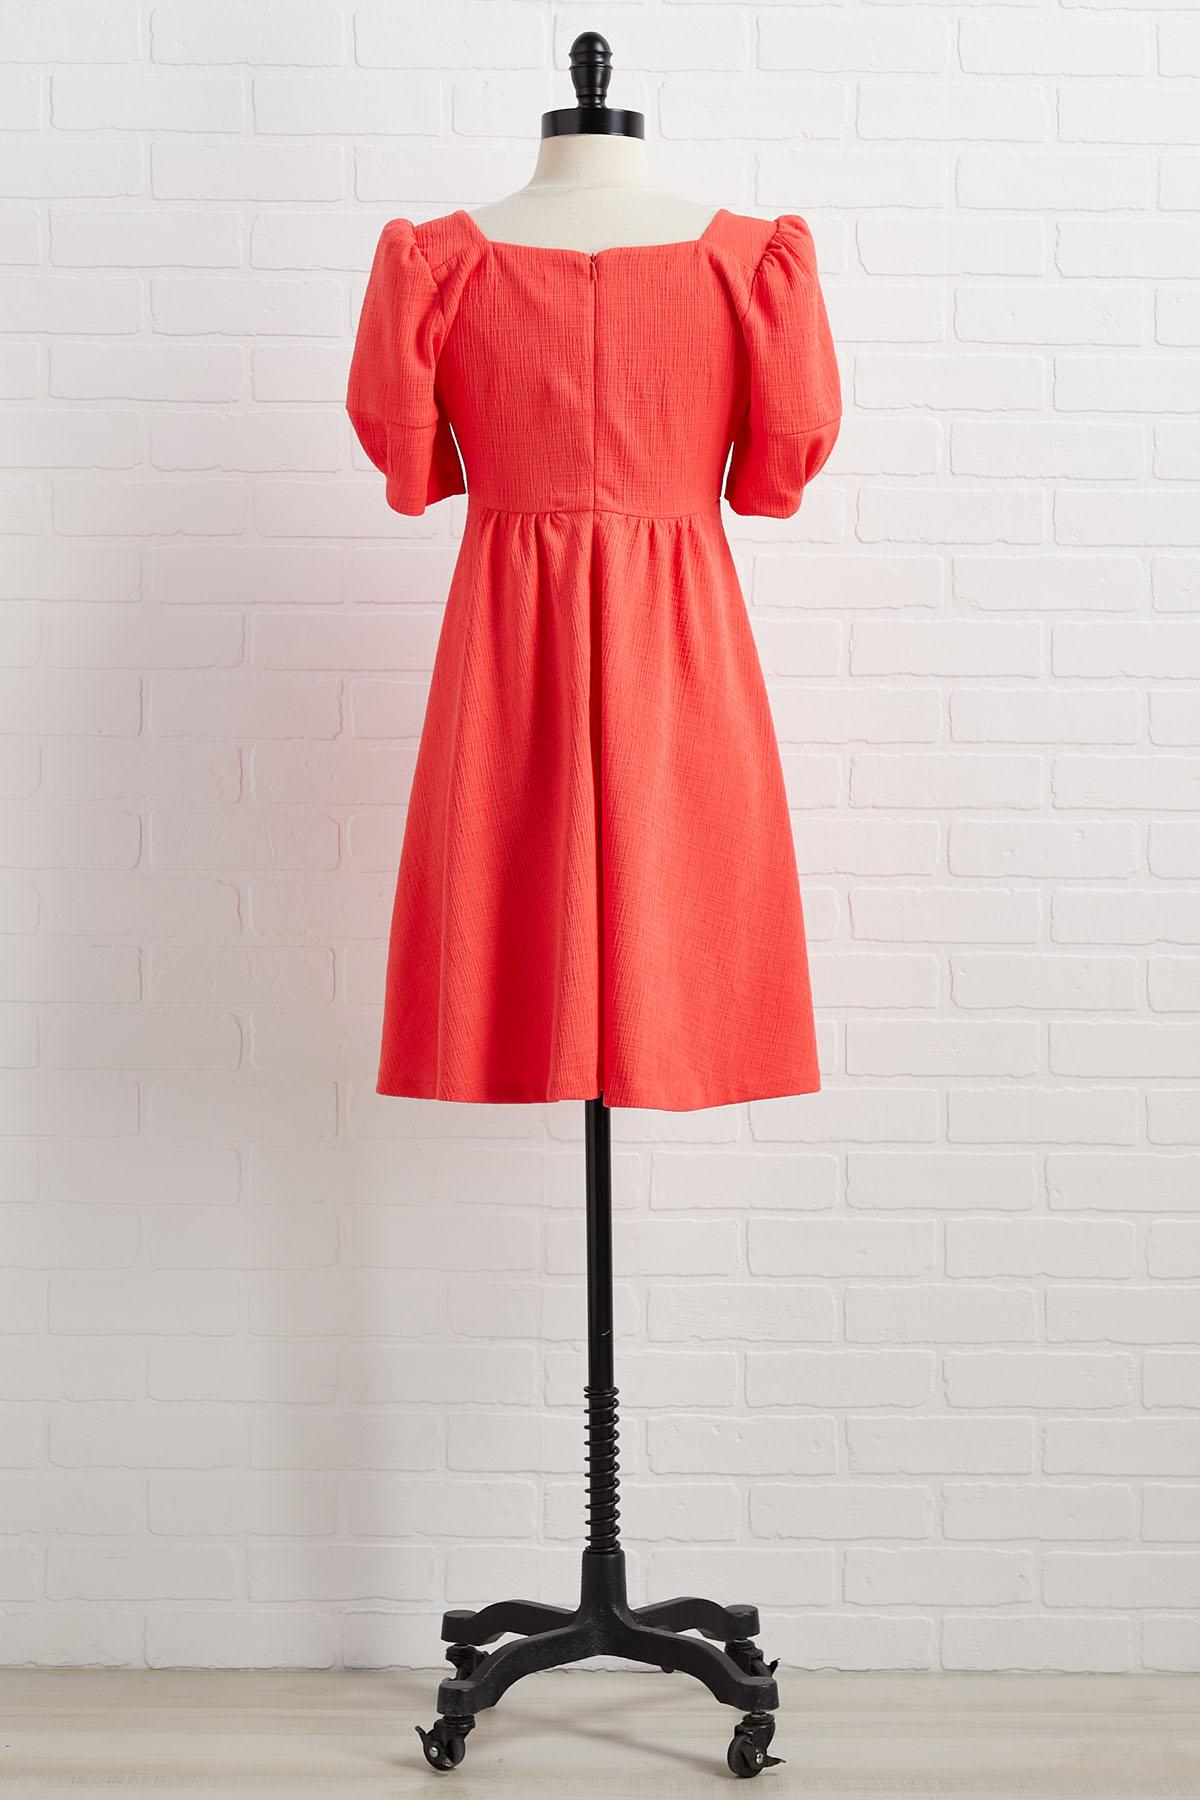 Orange You Glad To See Me Dress